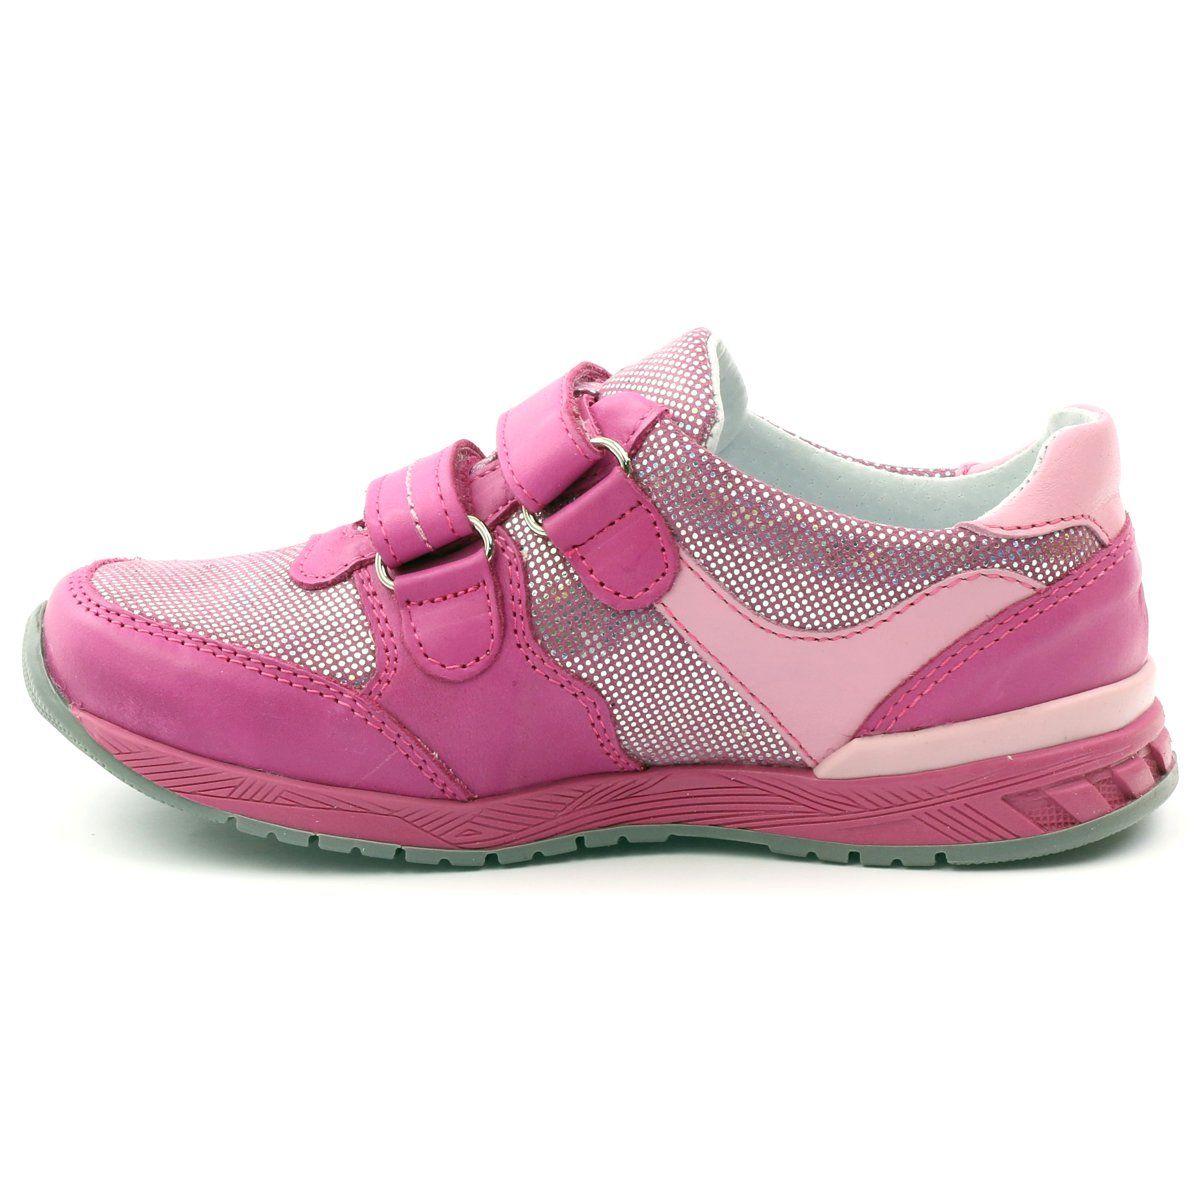 Polbuty Dziewczece Z Kwiatkiem Ren But 3265 Rozowe Szare Shoes Sneakers Fashion